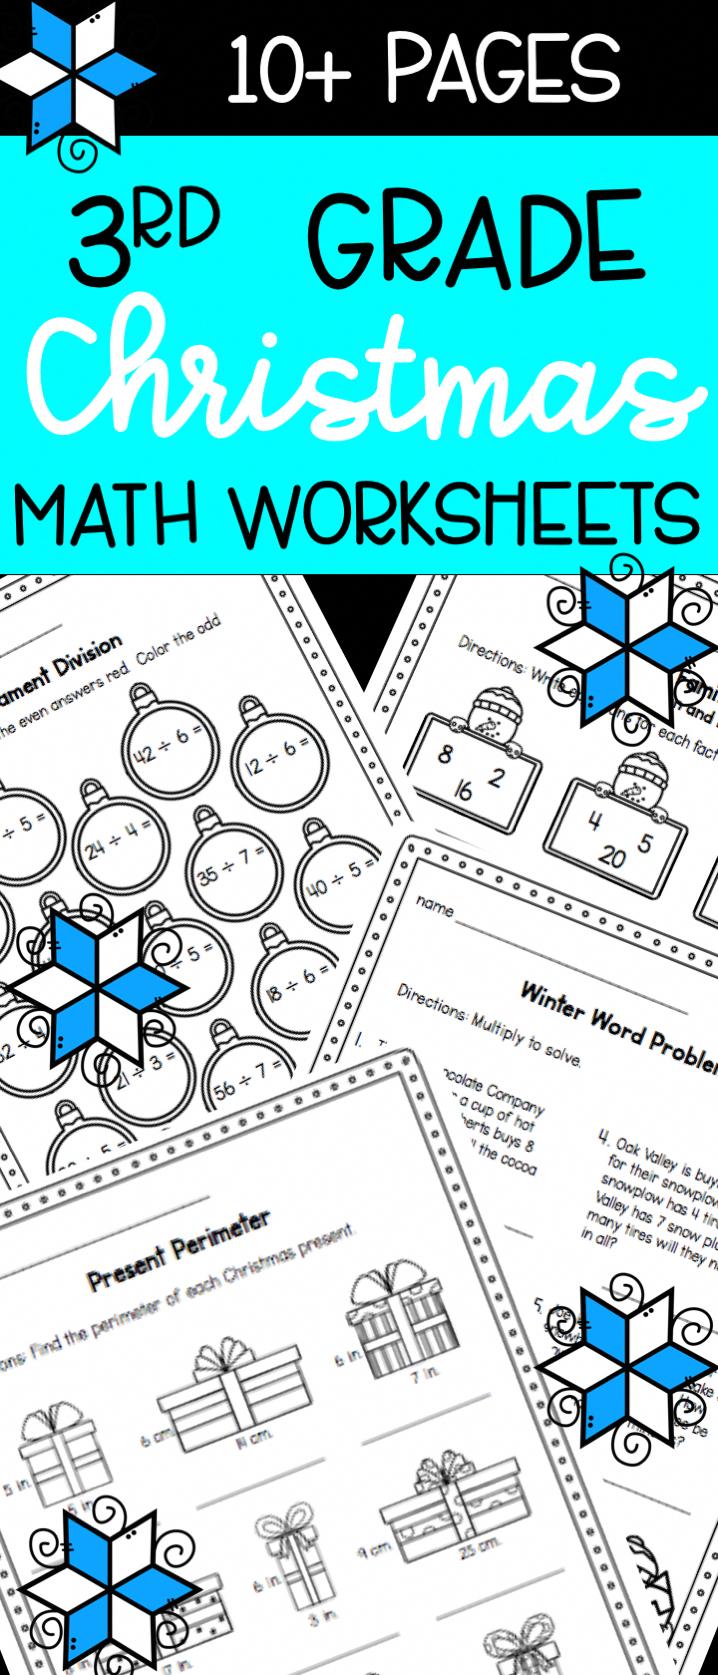 Christmas math worksheets for 3rd grade - multiplication, division ...